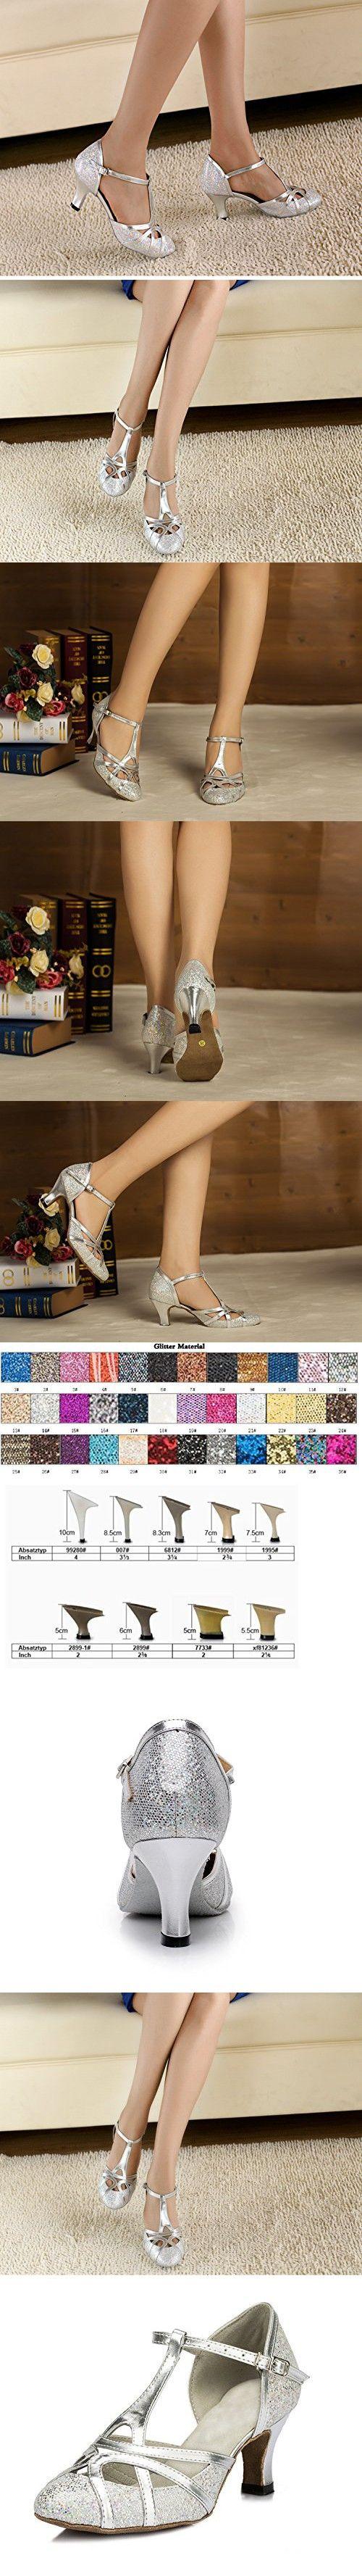 Minishion QJ6133 Women's Kitten Heel Silver Pleather Glitter Salsa Tango Ballroom Latin T-Strap Dance Shoes Wedding Pumps 7 M US